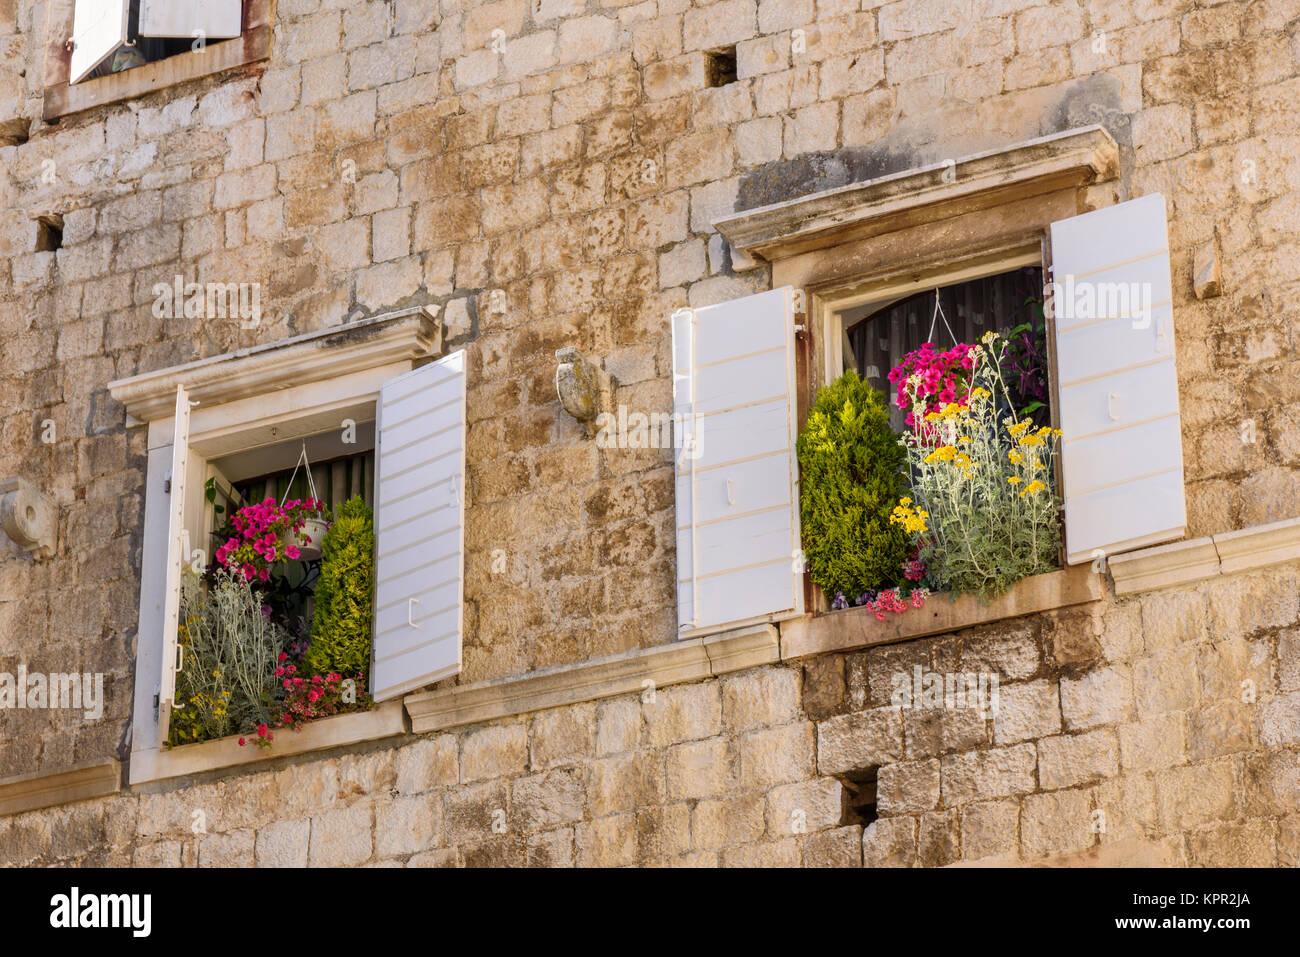 Window boxes, Trogir Old Town, Croatia - Stock Image